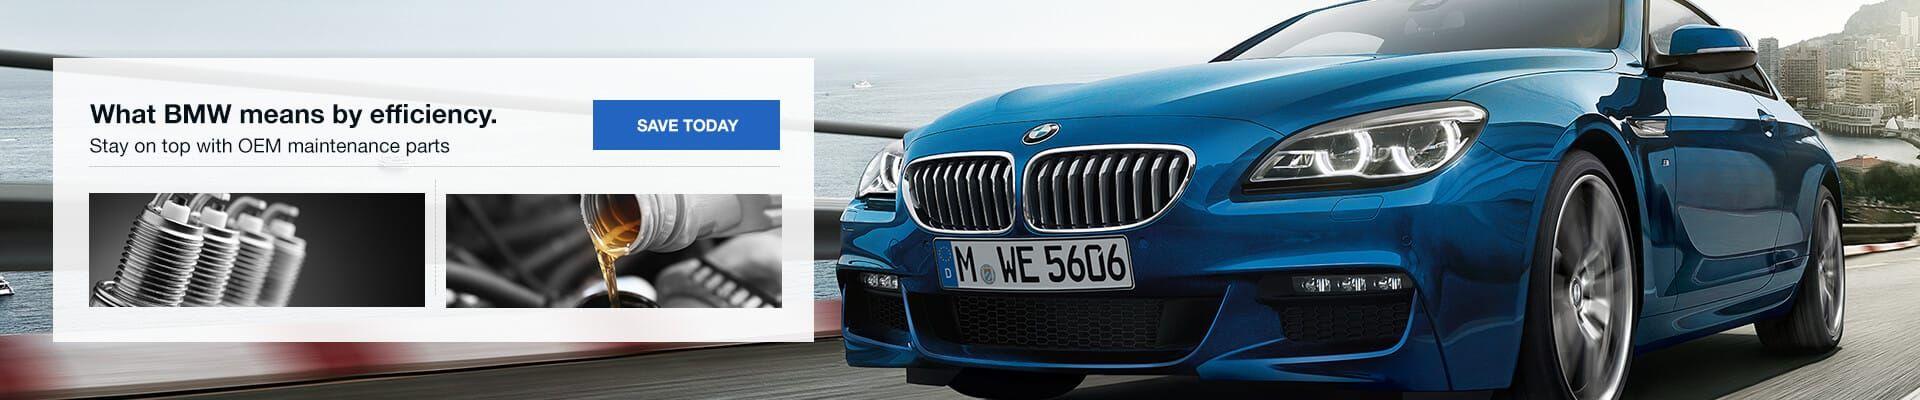 BMW Maintenance Parts